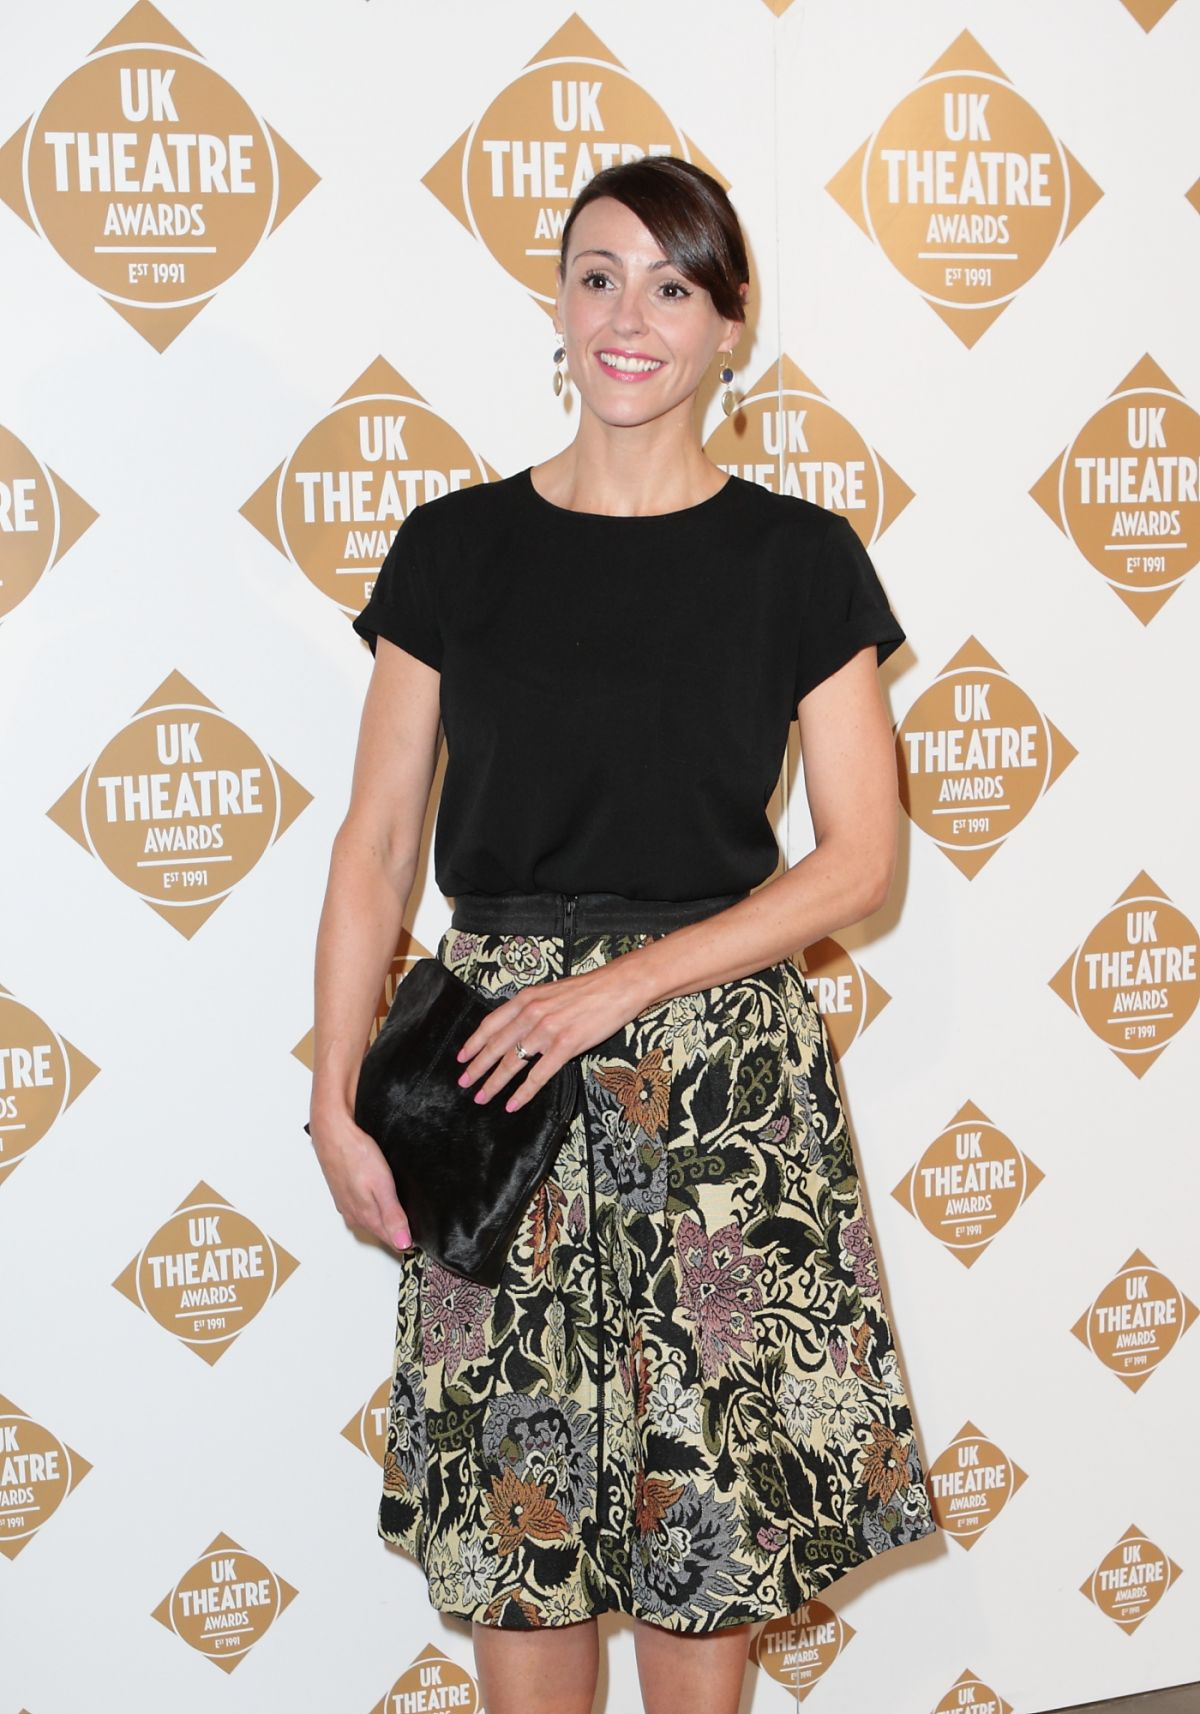 SURANNE JONES at UK Theatre Awards 2014 in London